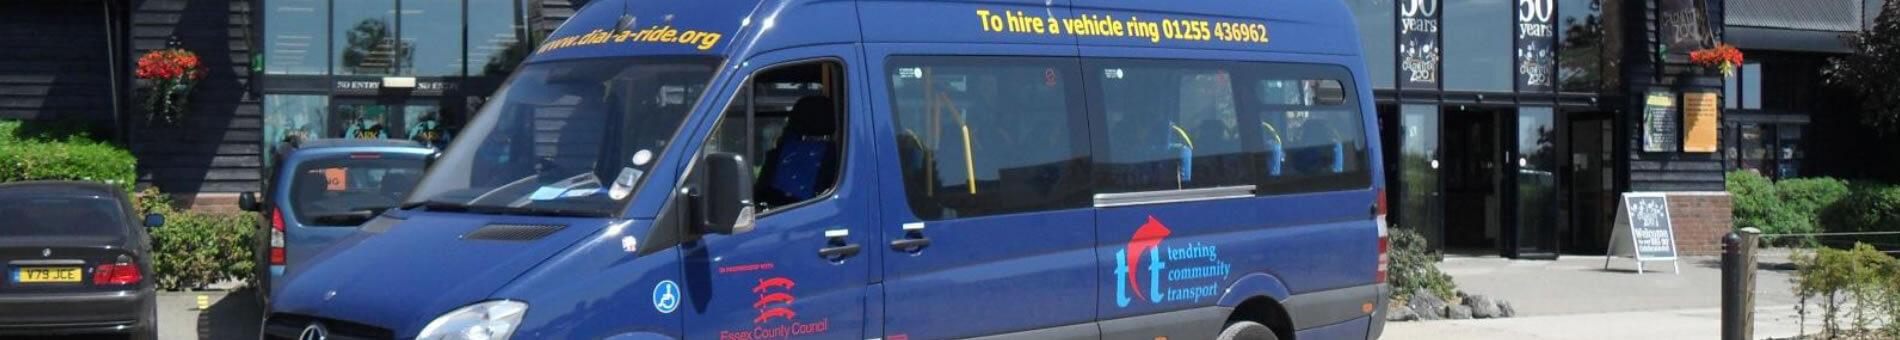 Tendring Community Transport